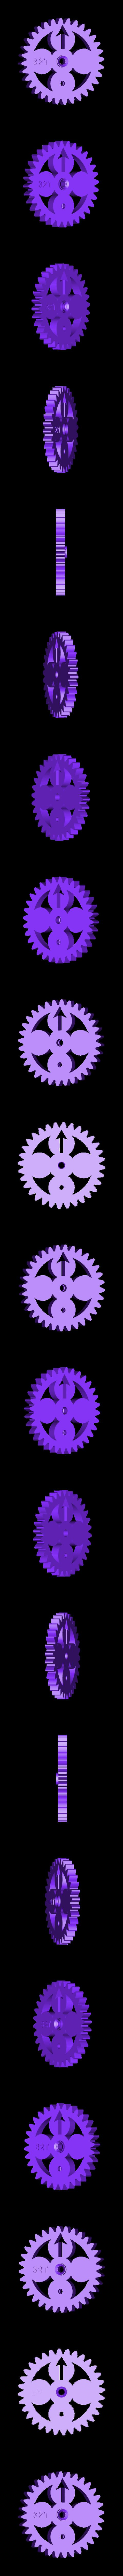 GEAR-32T_R2.stl Download free STL file Math Gear(s) • 3D print design, WorksBySolo